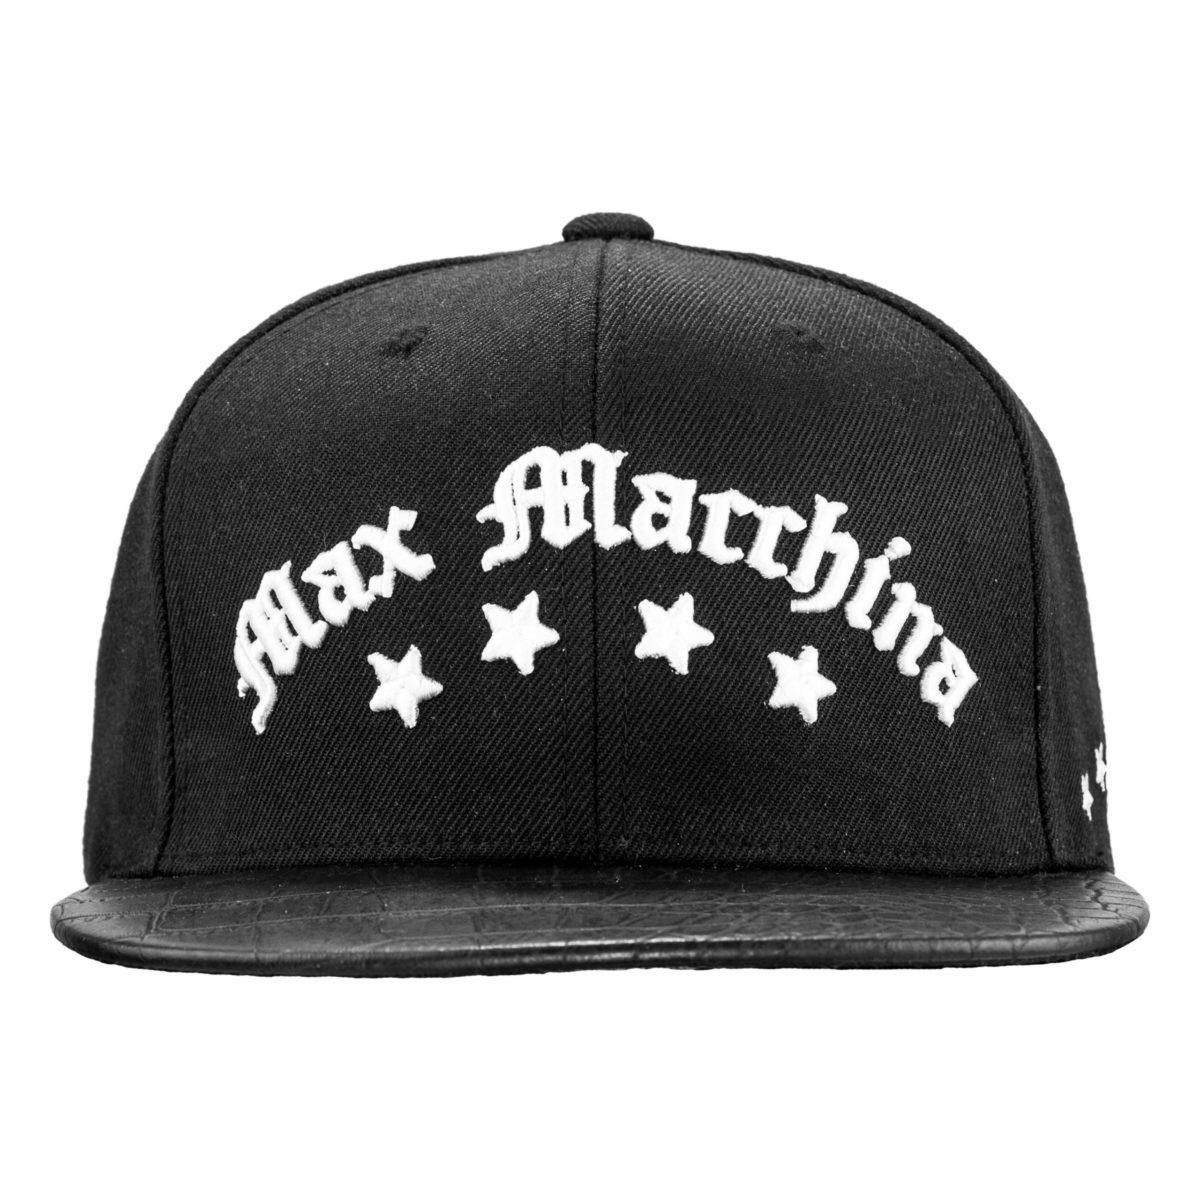 Luxury_Snapback_Rockstar_front